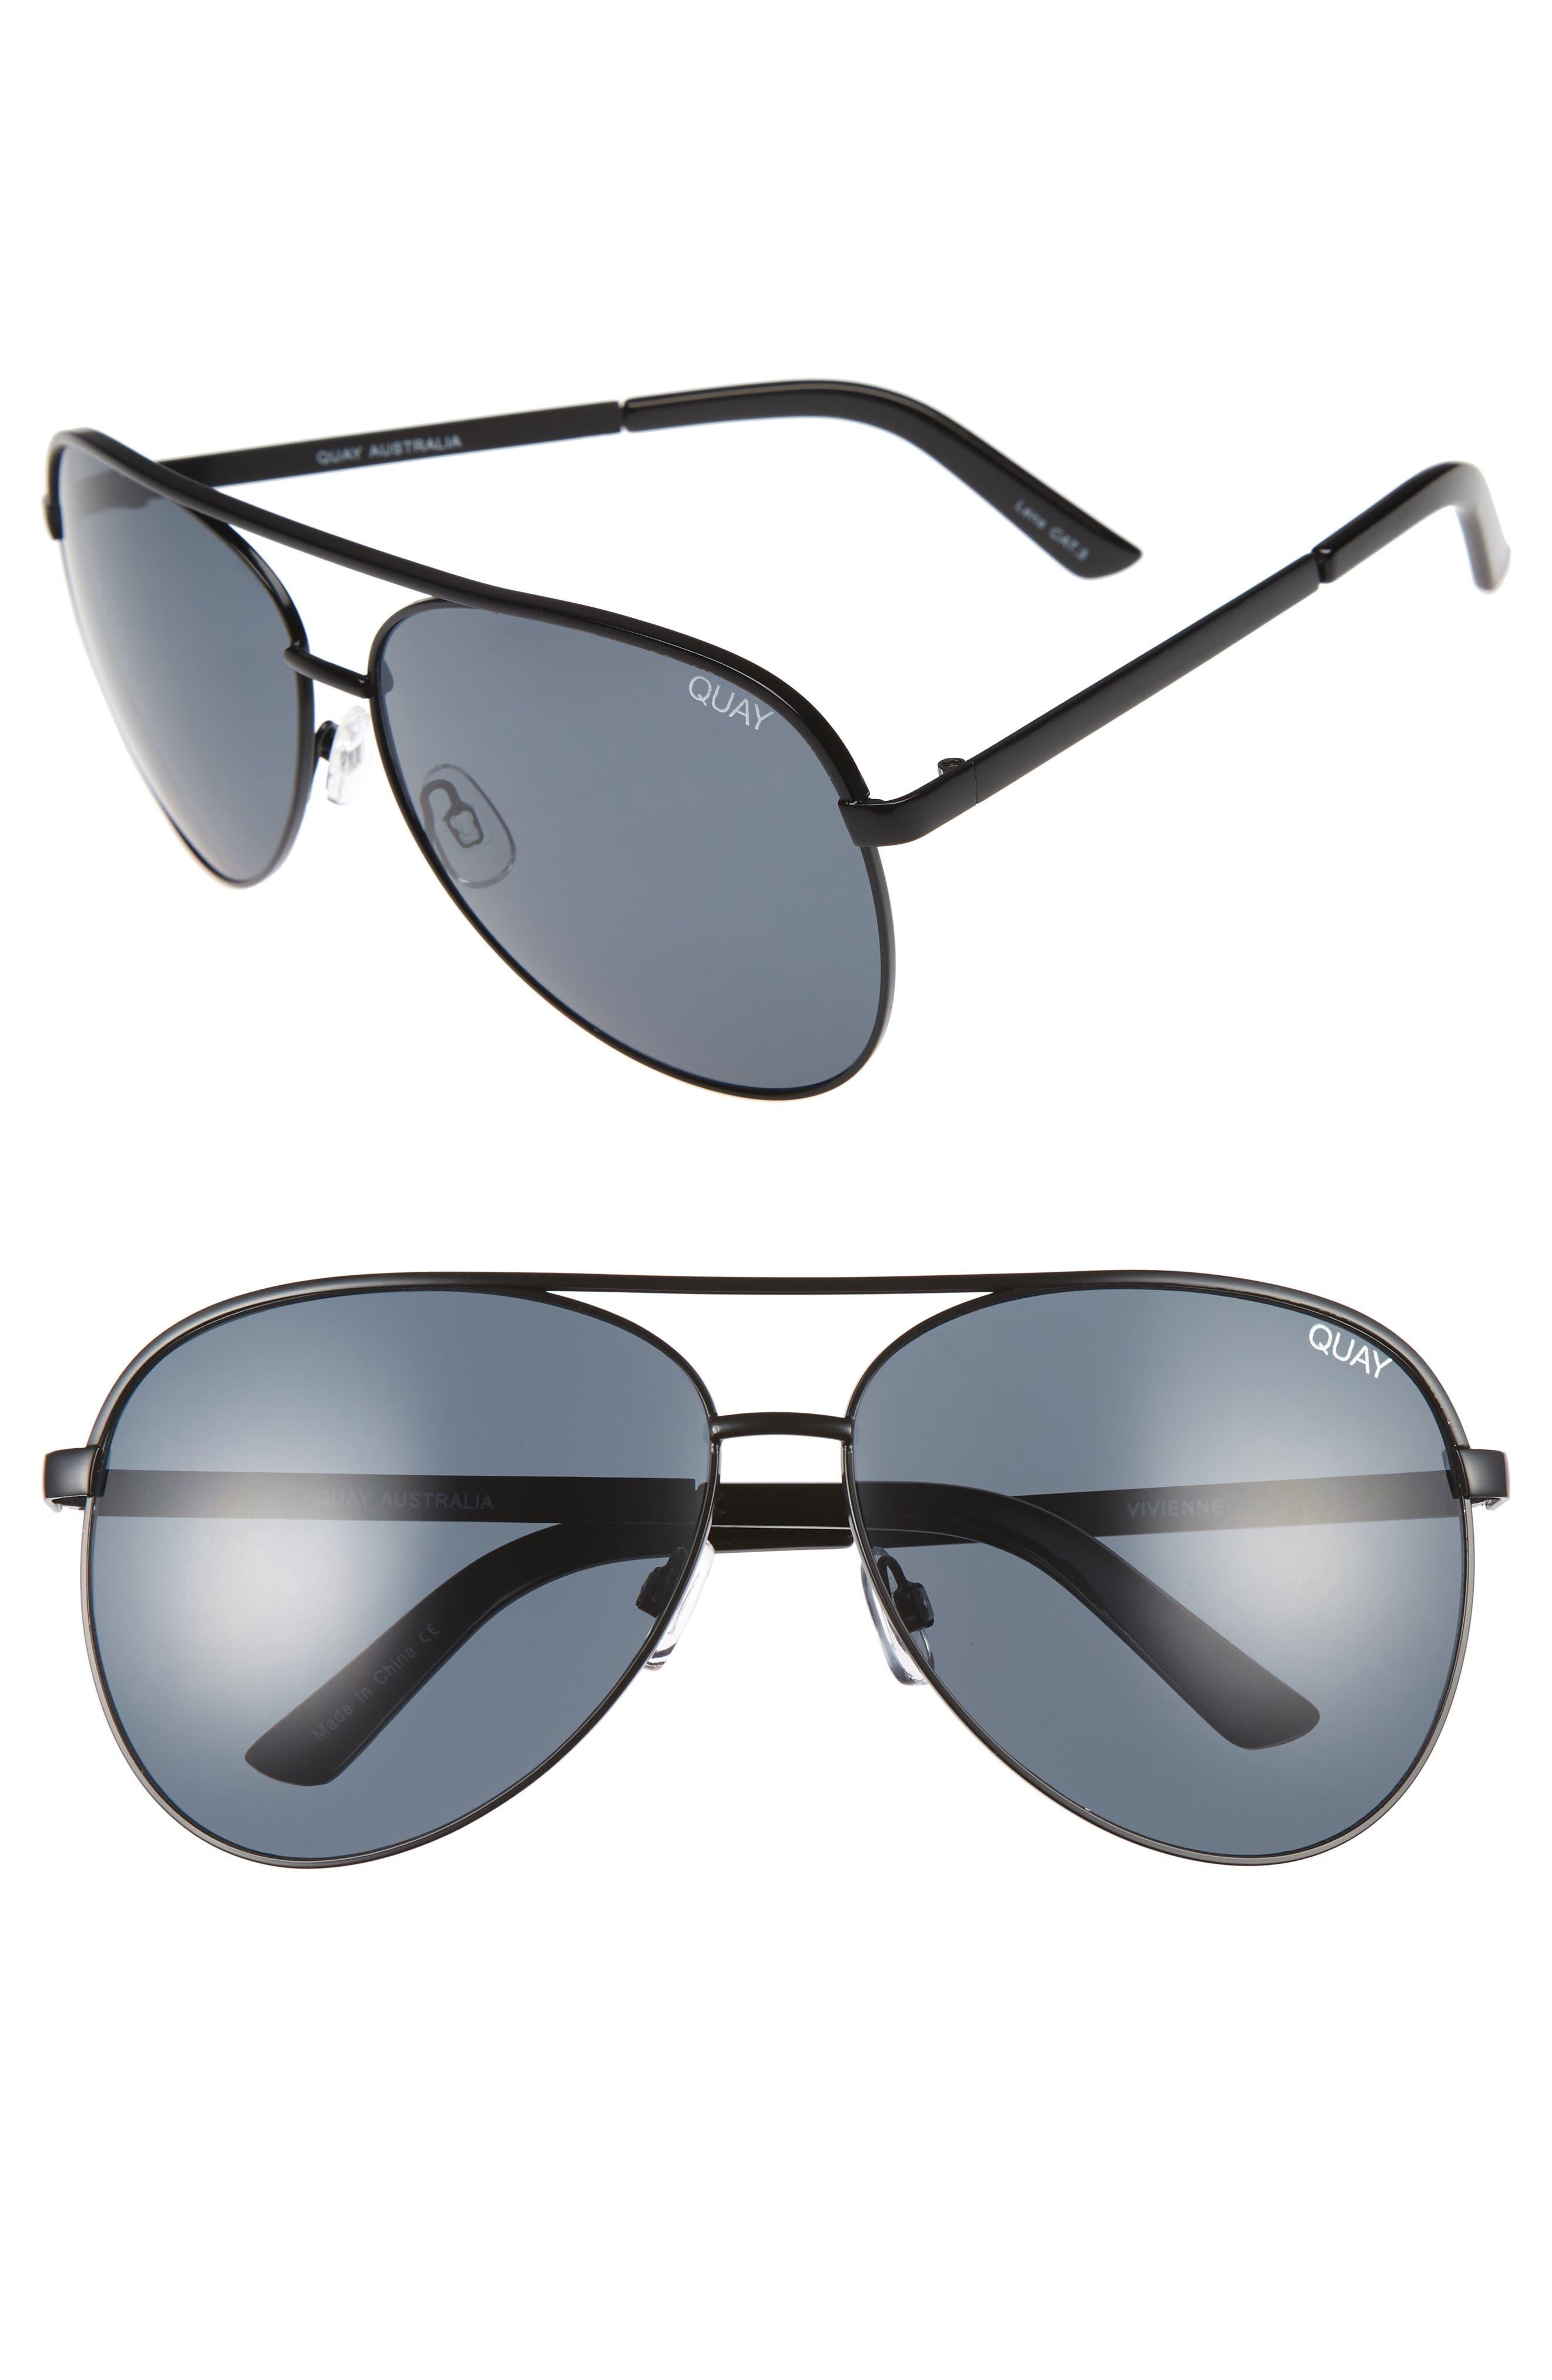 Vivienne 64mm Aviator Sunglasses,                             Main thumbnail 1, color,                             BLACK/ SMOKE